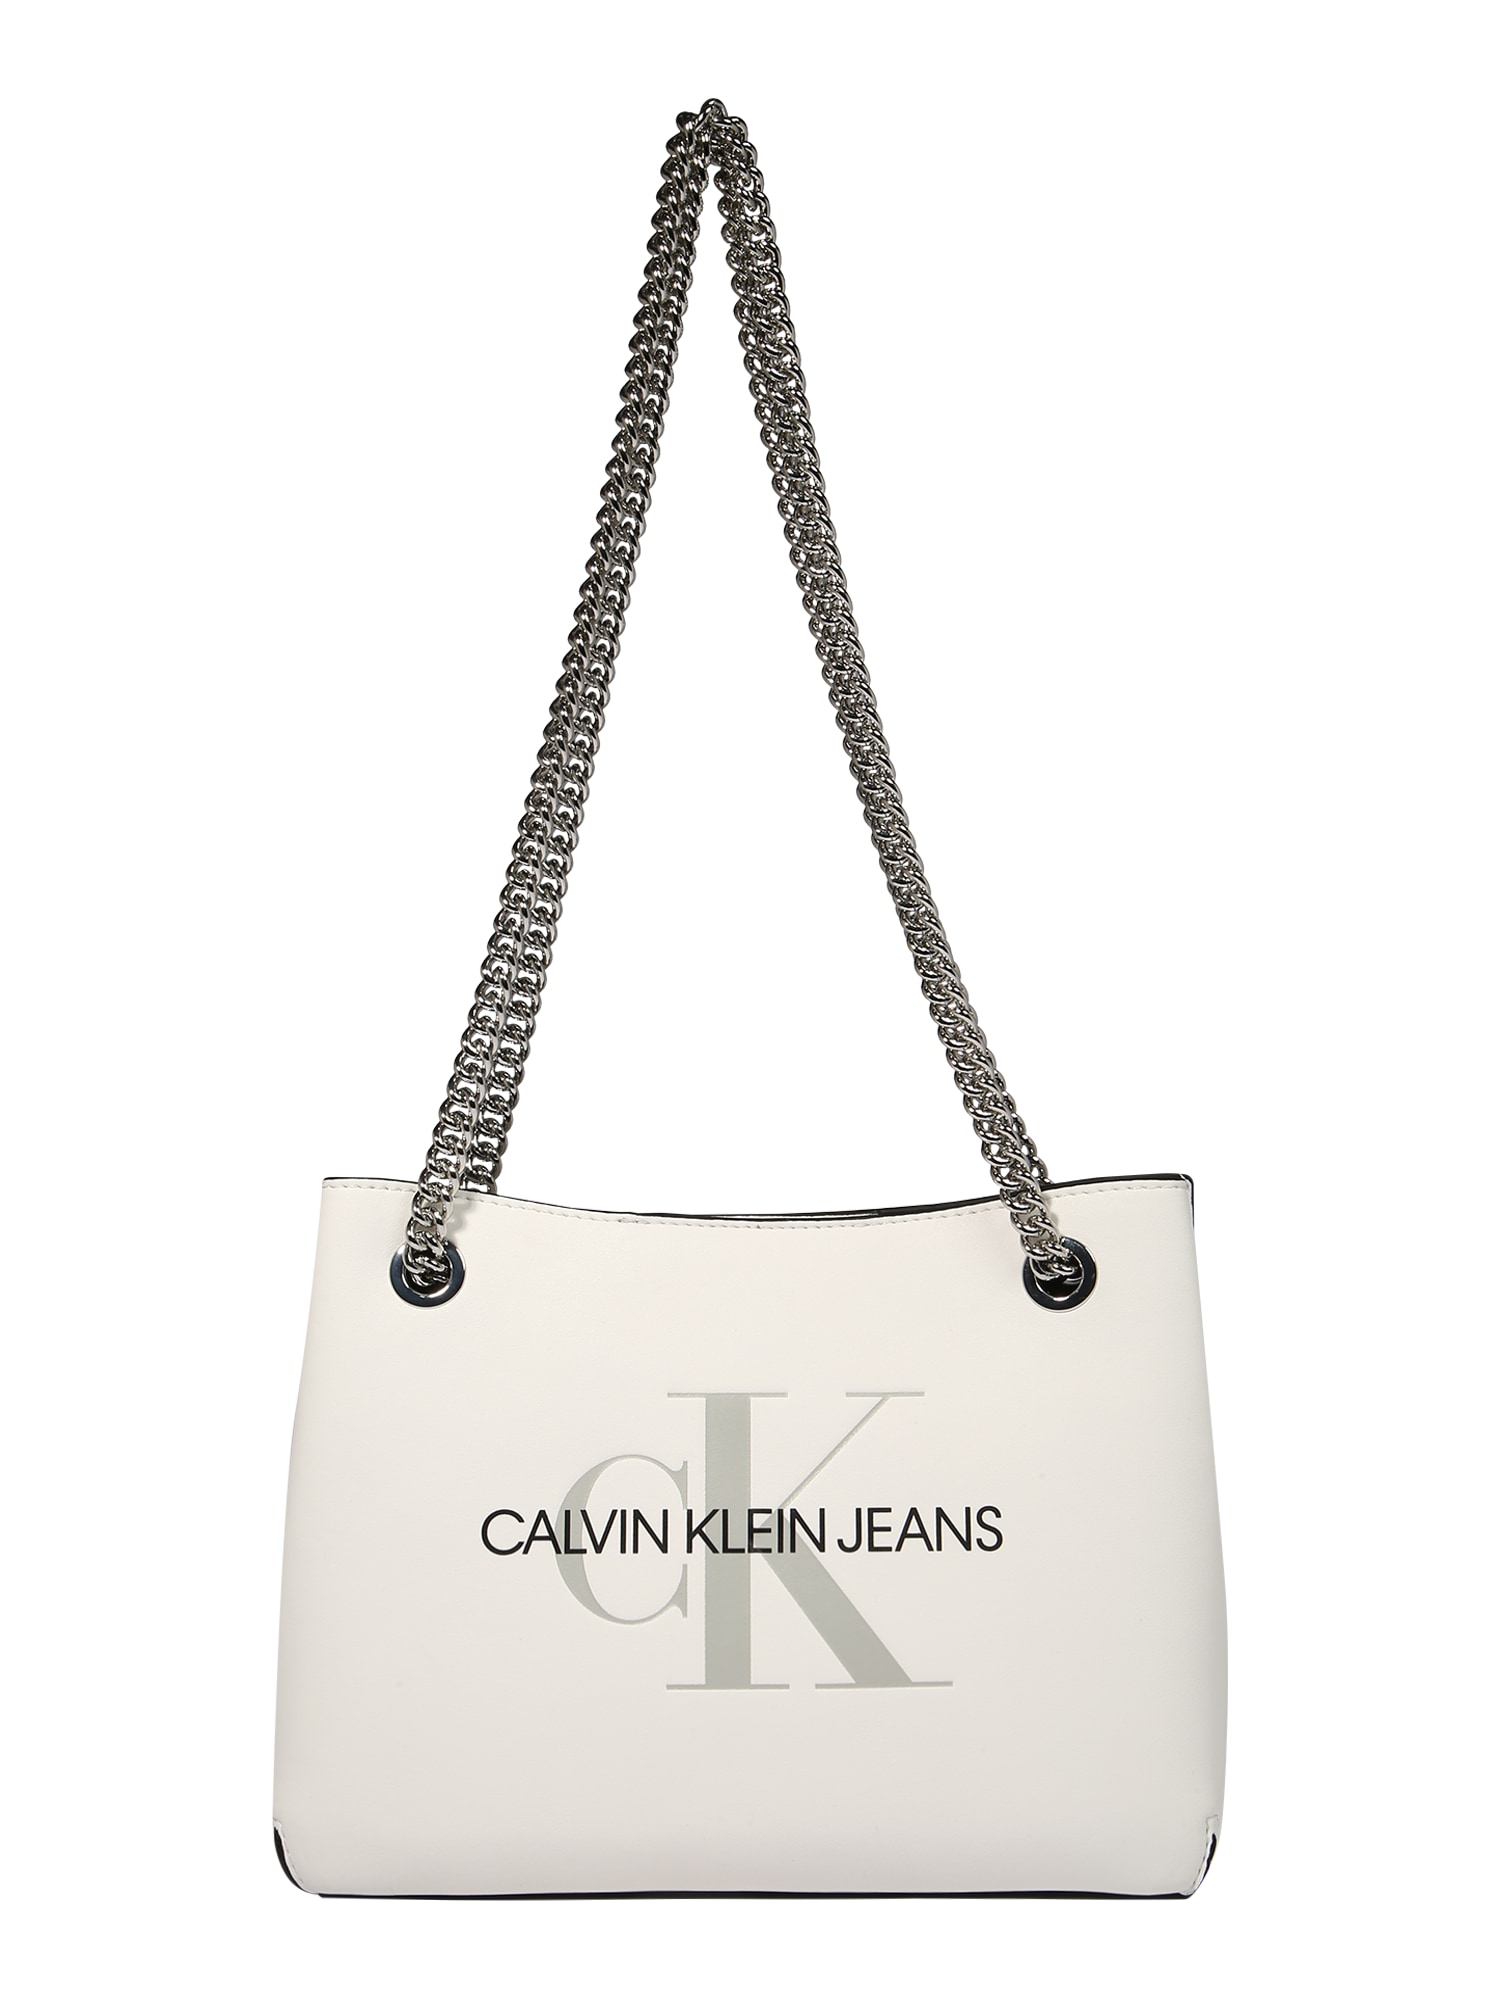 Calvin Klein Jeans Rankinė ant peties balta / juoda / bazalto pilka